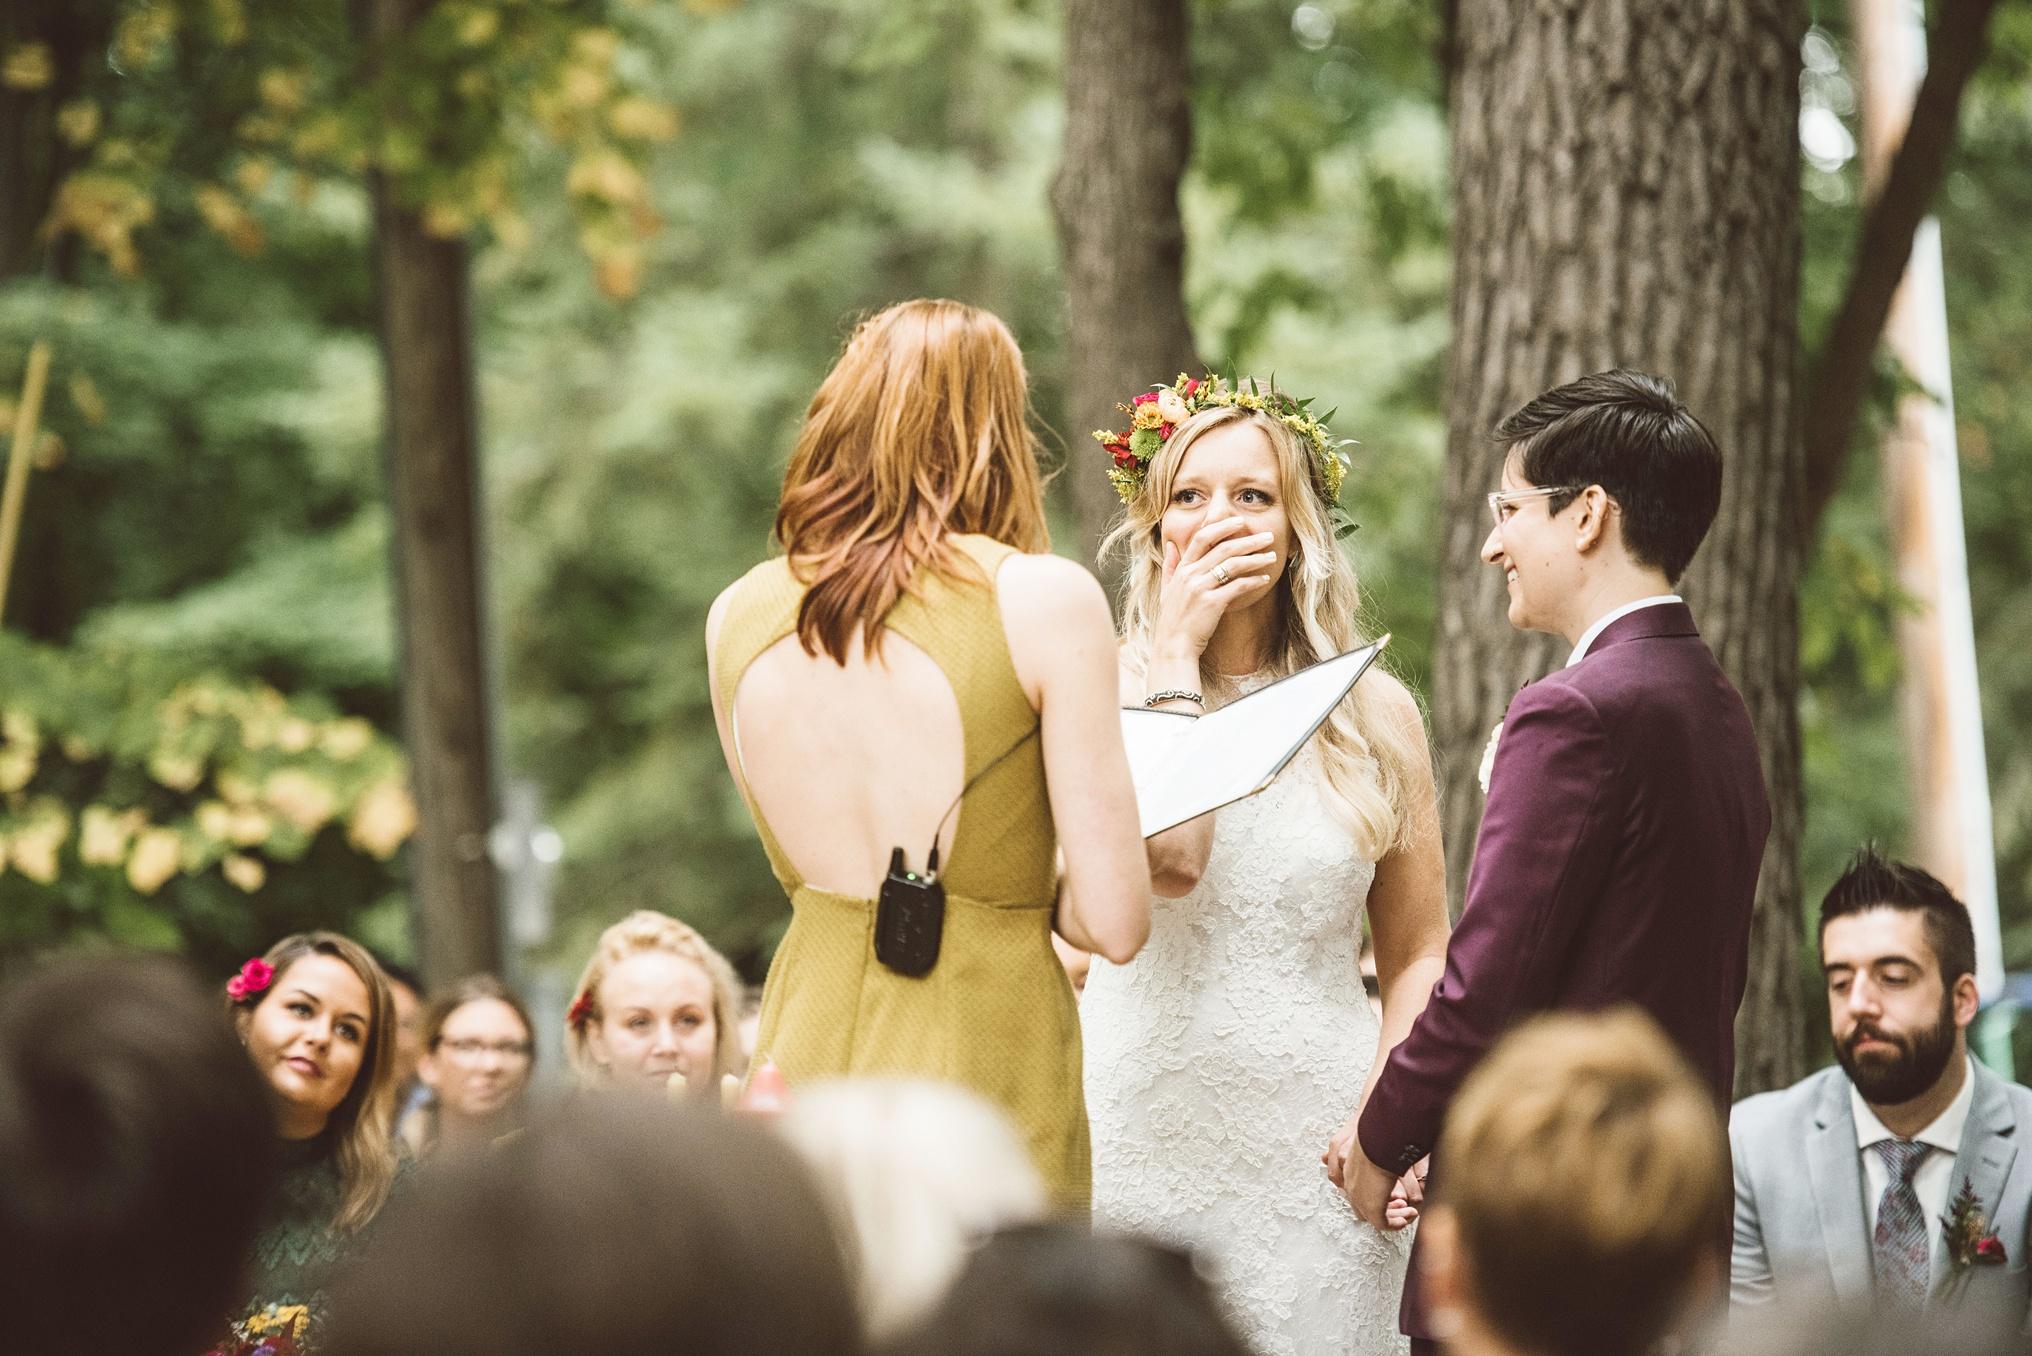 best_wedding_photography_2017_by_lucas_botz_photography_036.jpg